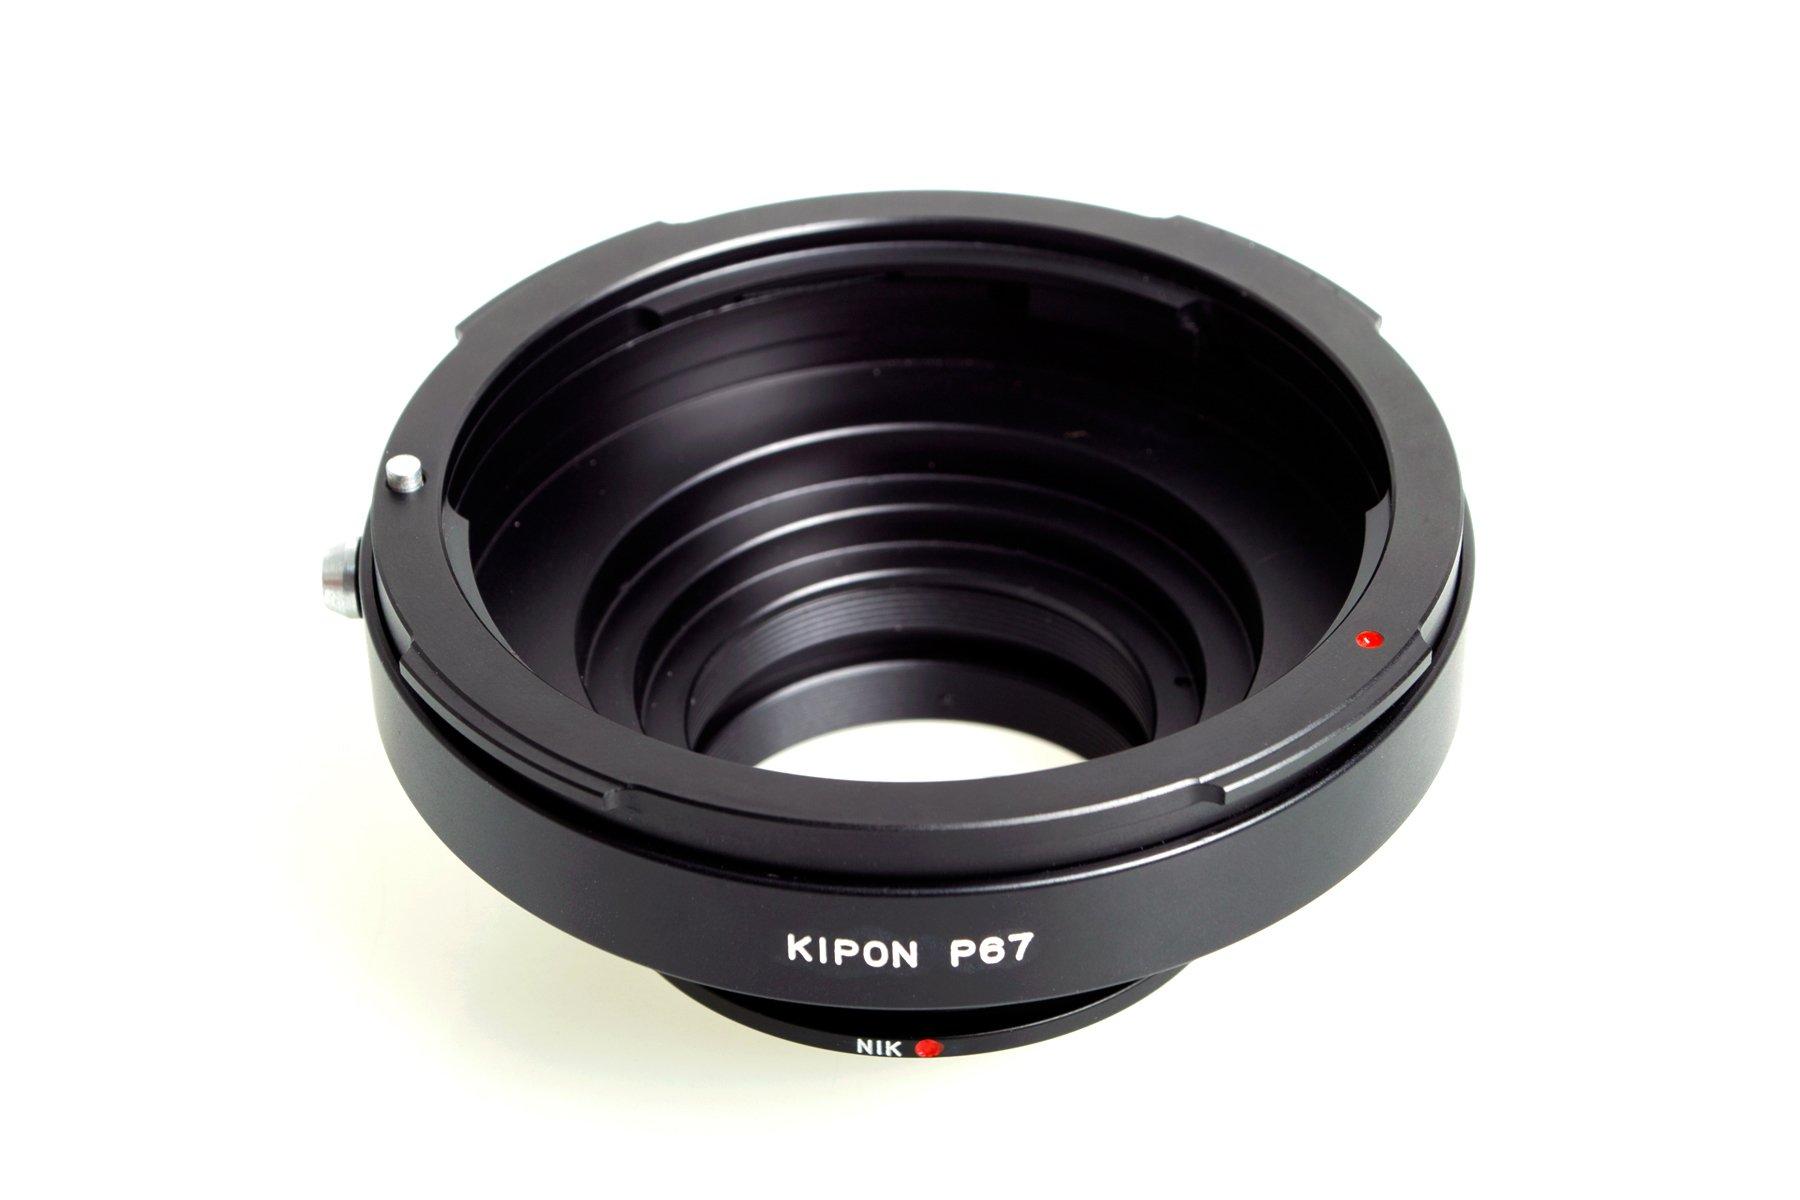 KIPON adaptér objektivu Pentax 67 na tělo Nikon F